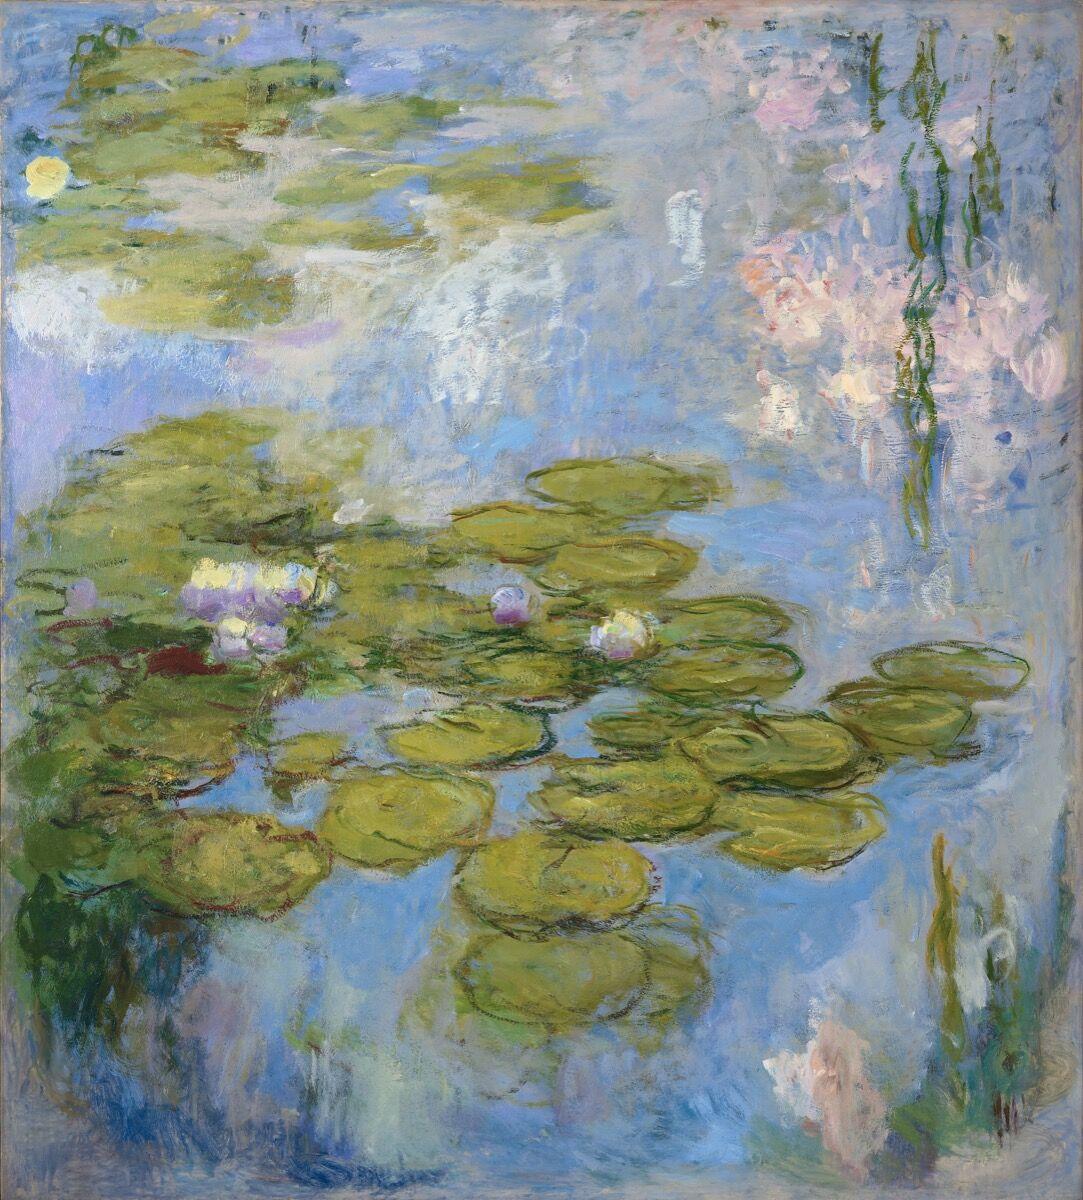 Claude Monet, Nymphéas, 1916-19. Fondation Beyeler.